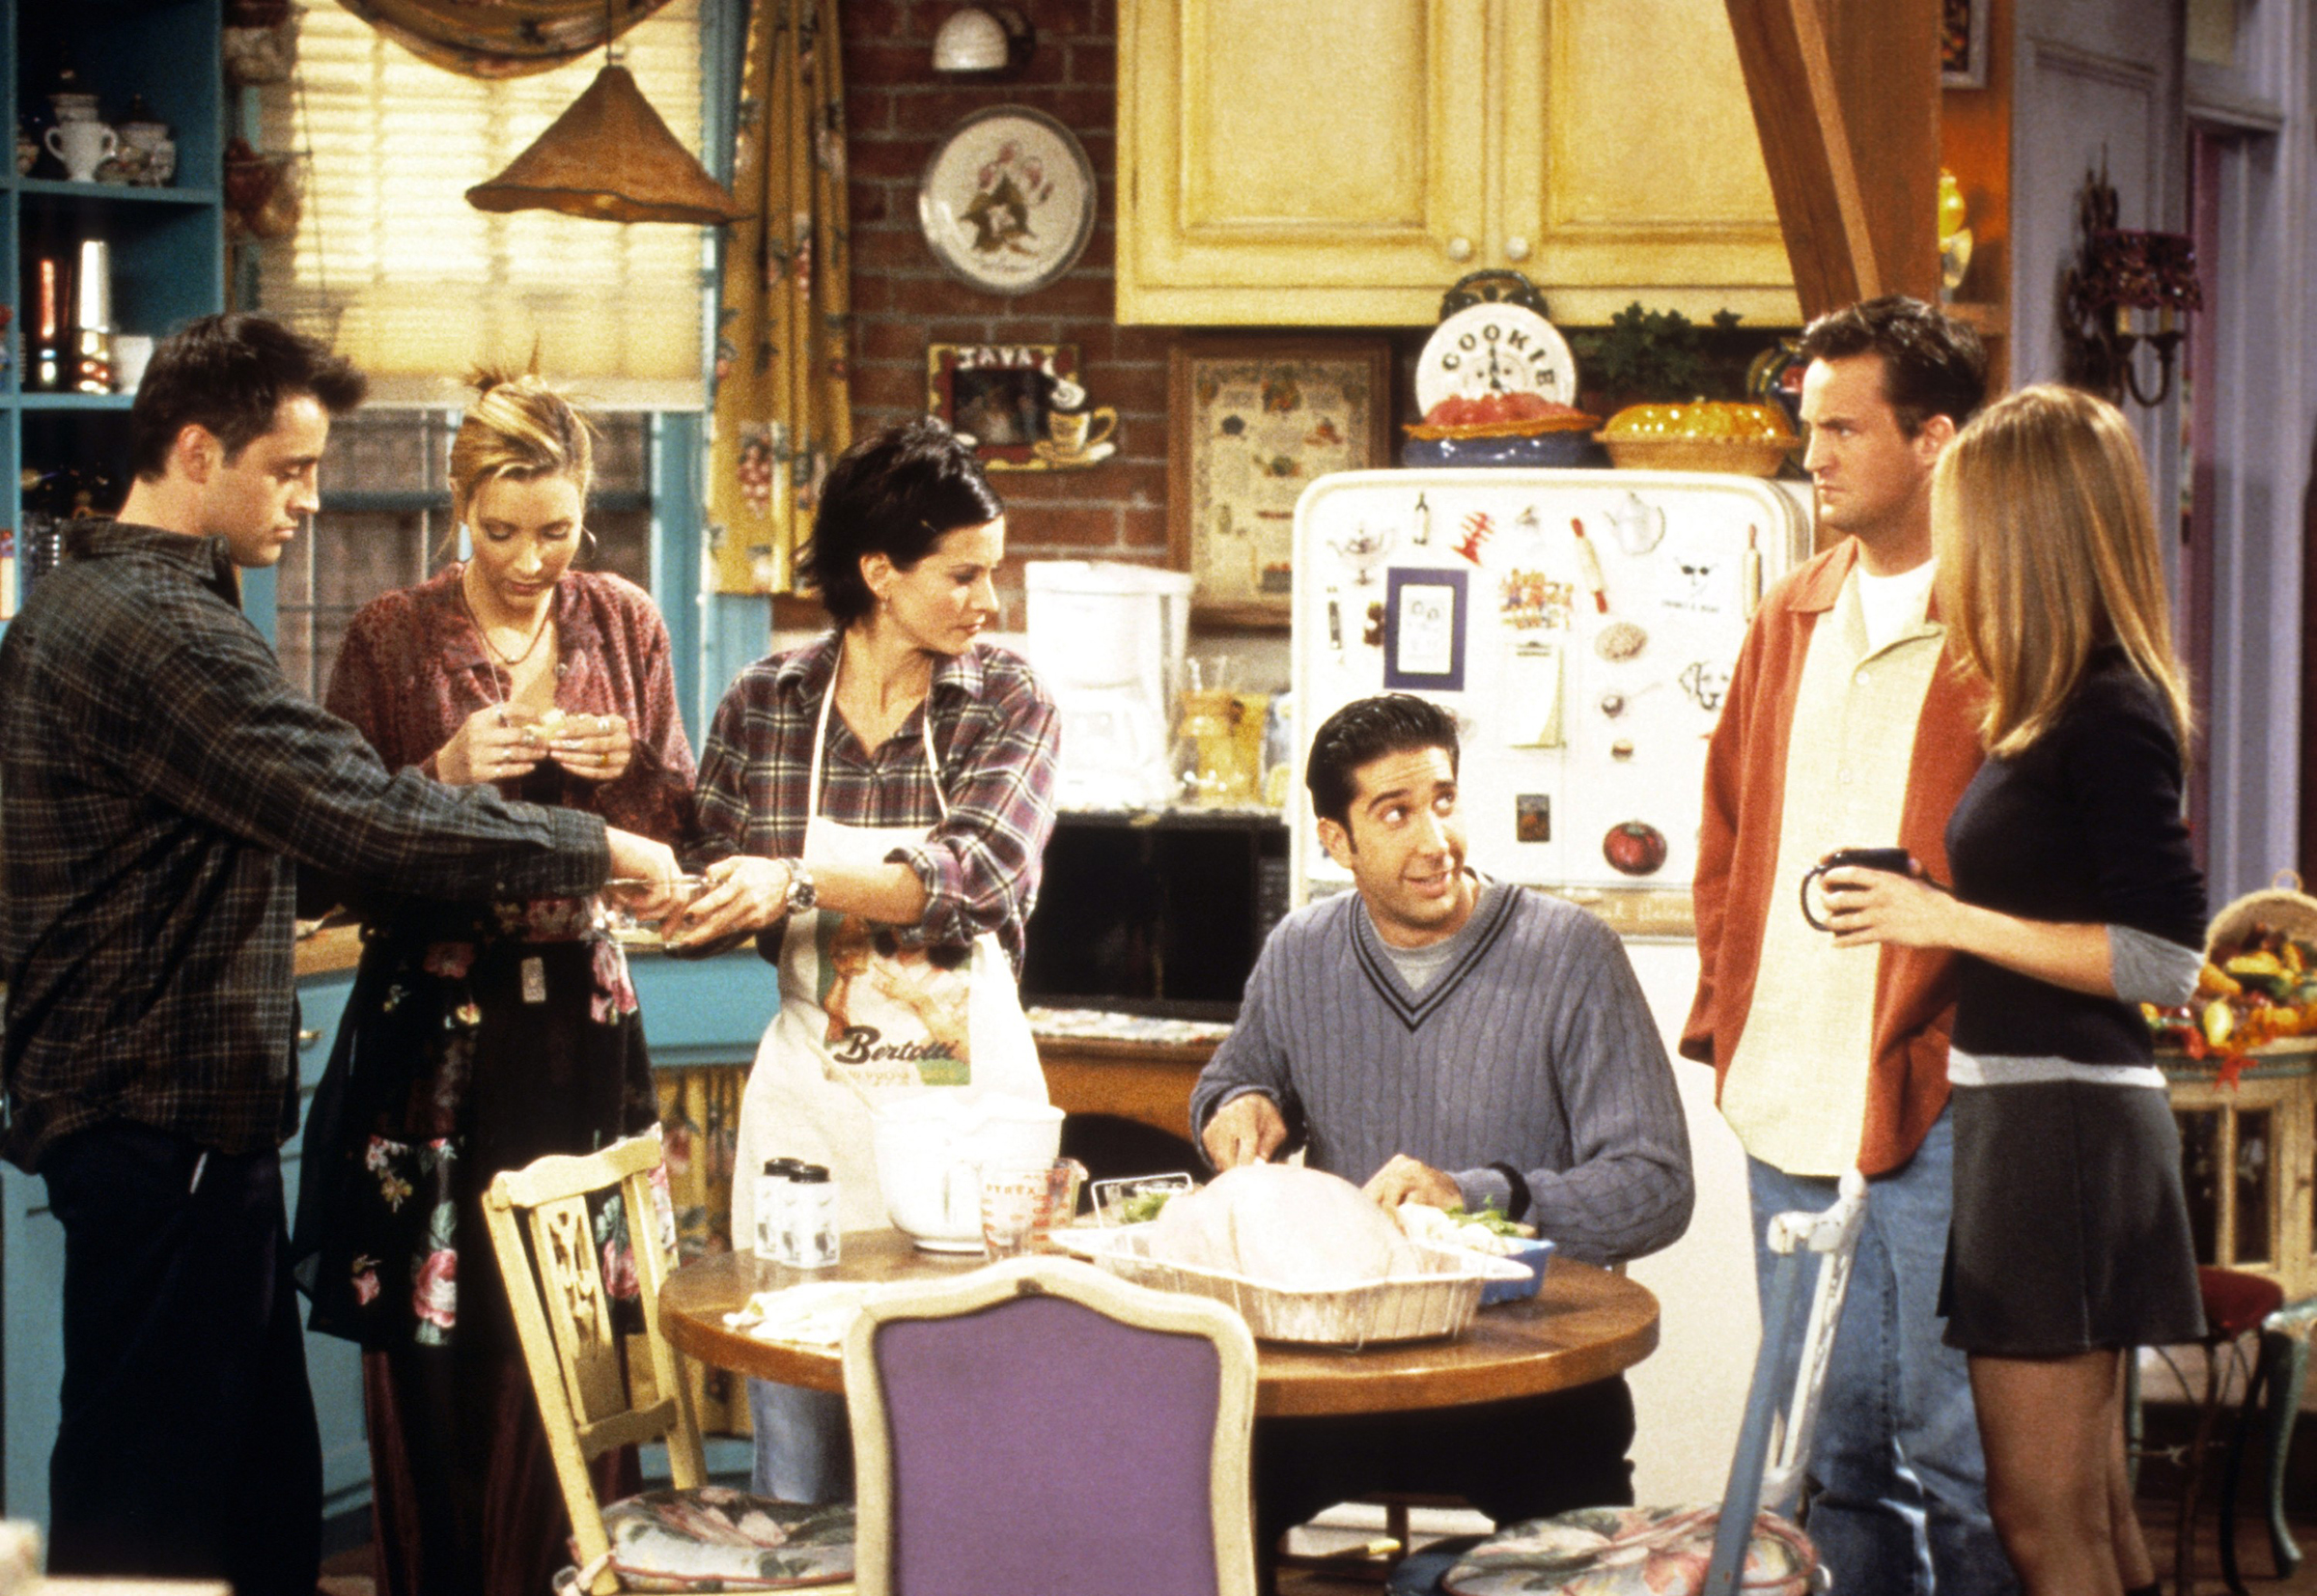 (L-R) Matt LeBlanc, Lisa Kudrow, Courteney Cox, David Schwimmer, Matthew Perry, Jennifer Aniston in 'Friends'.